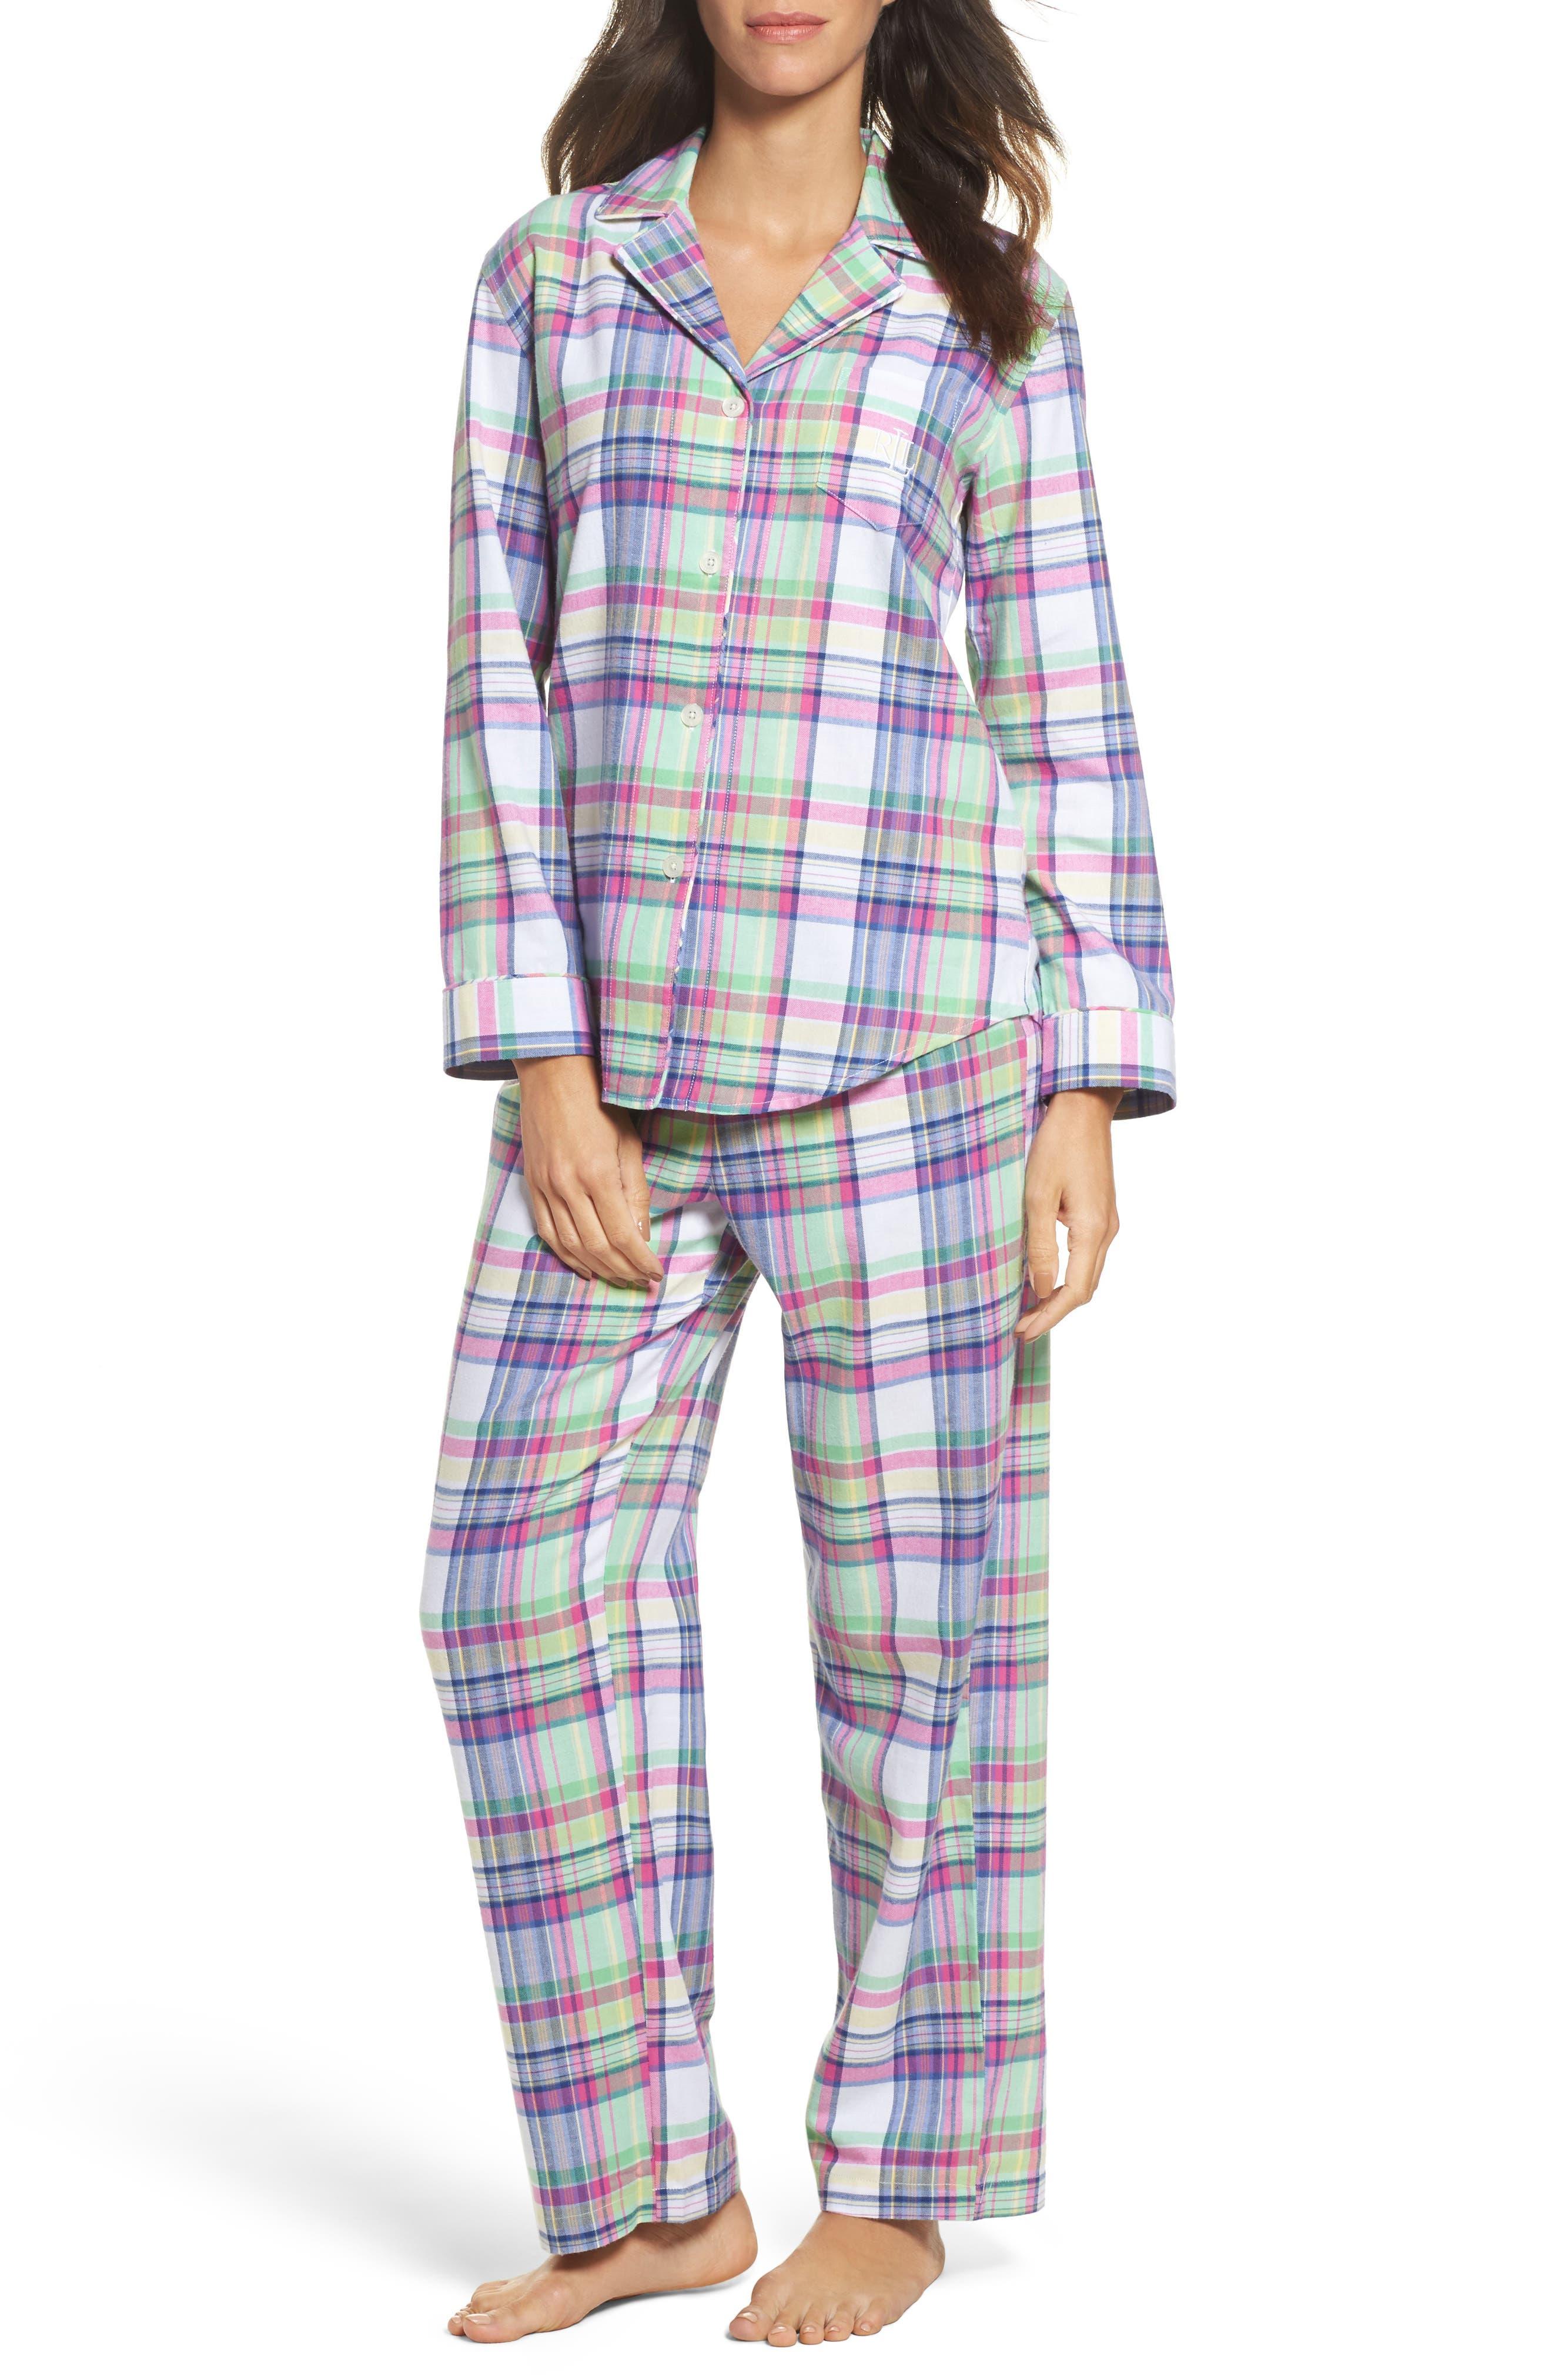 Notch Collar Pajamas,                             Main thumbnail 1, color,                             304